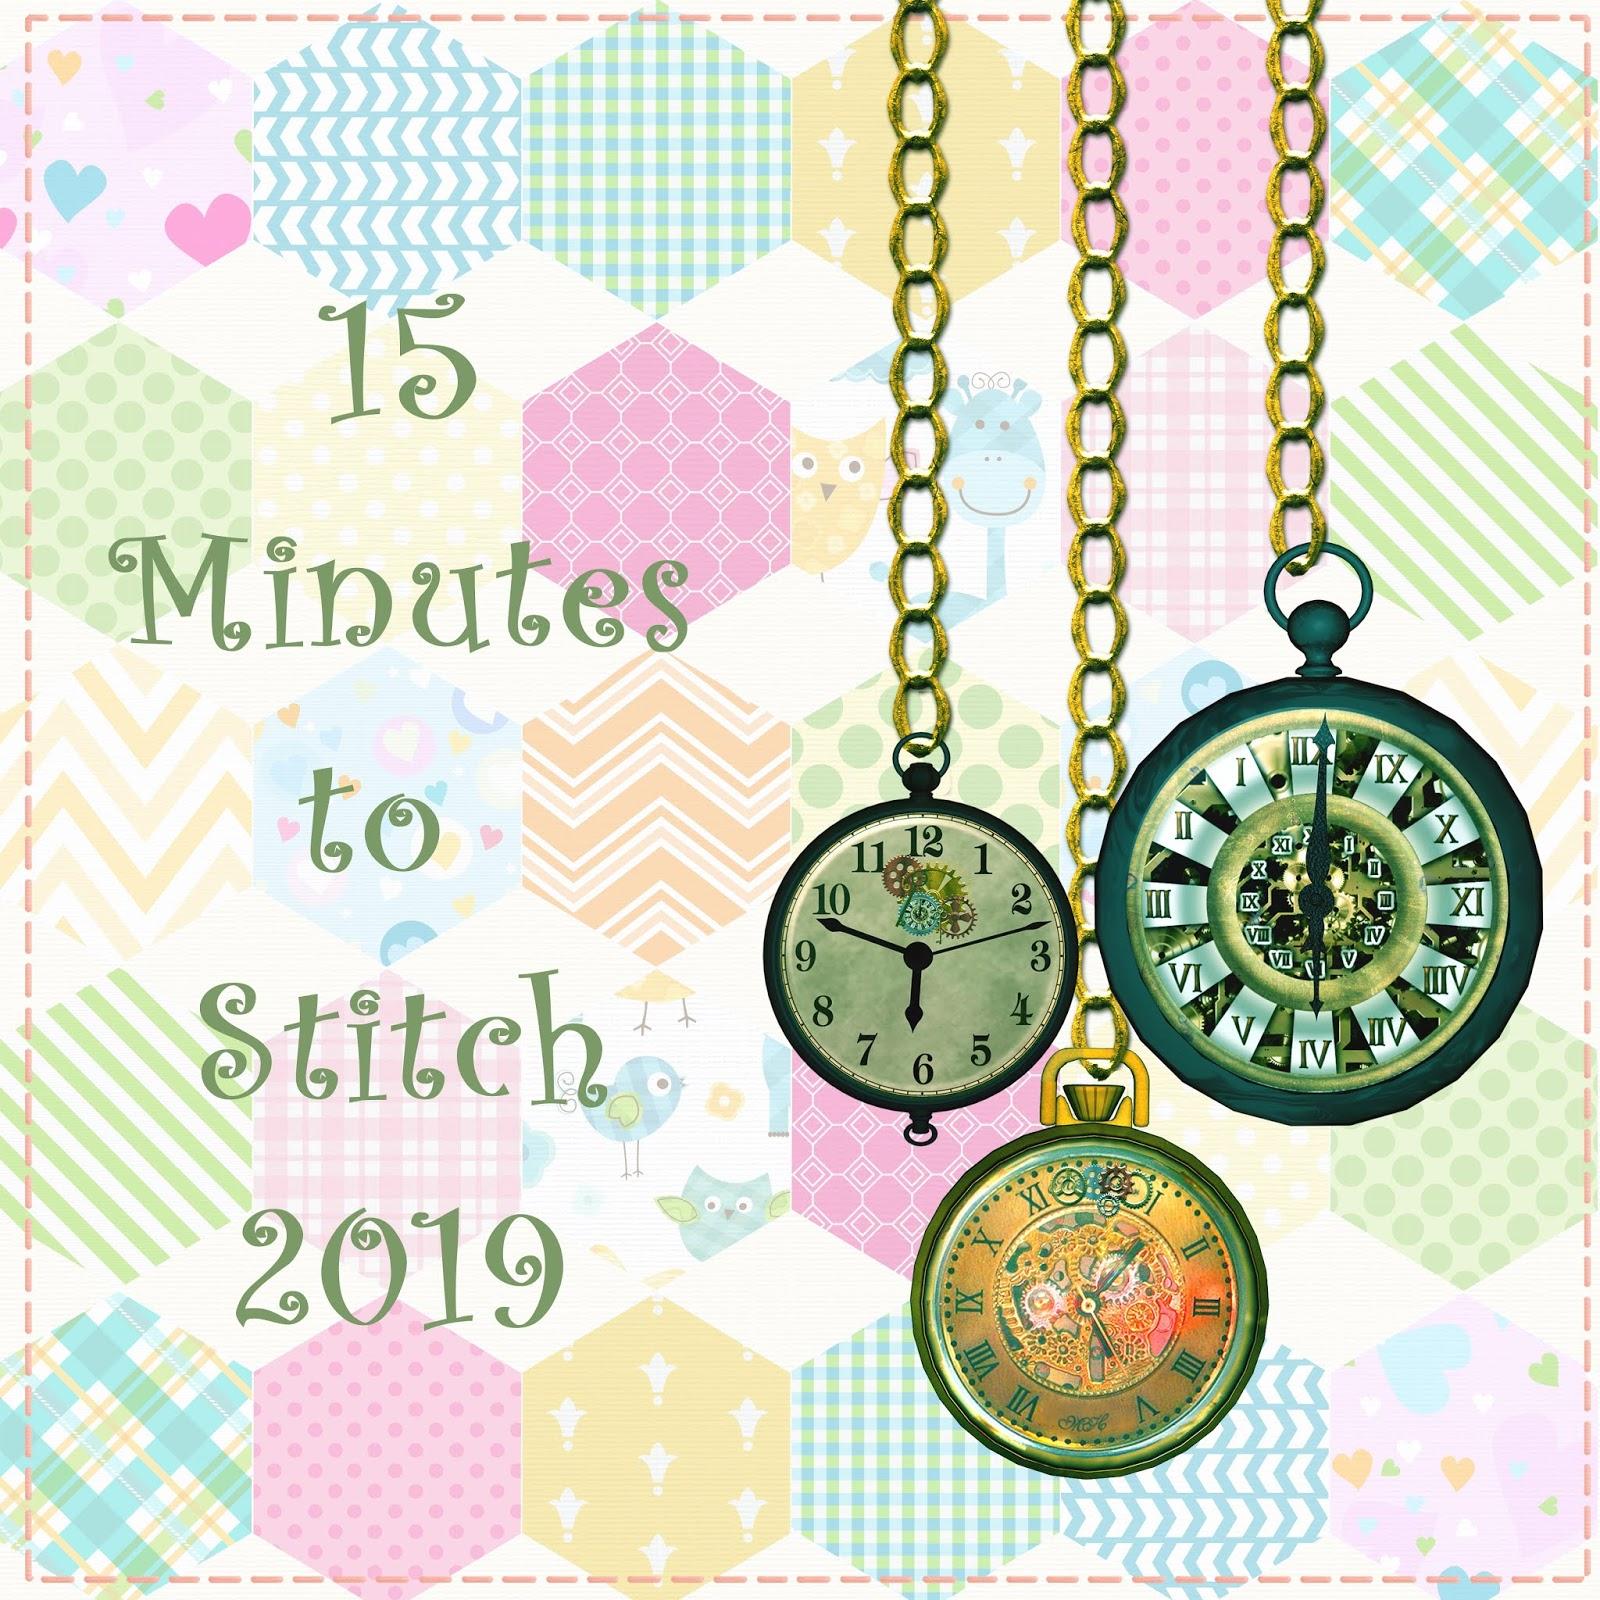 15 Minutes to Stitch